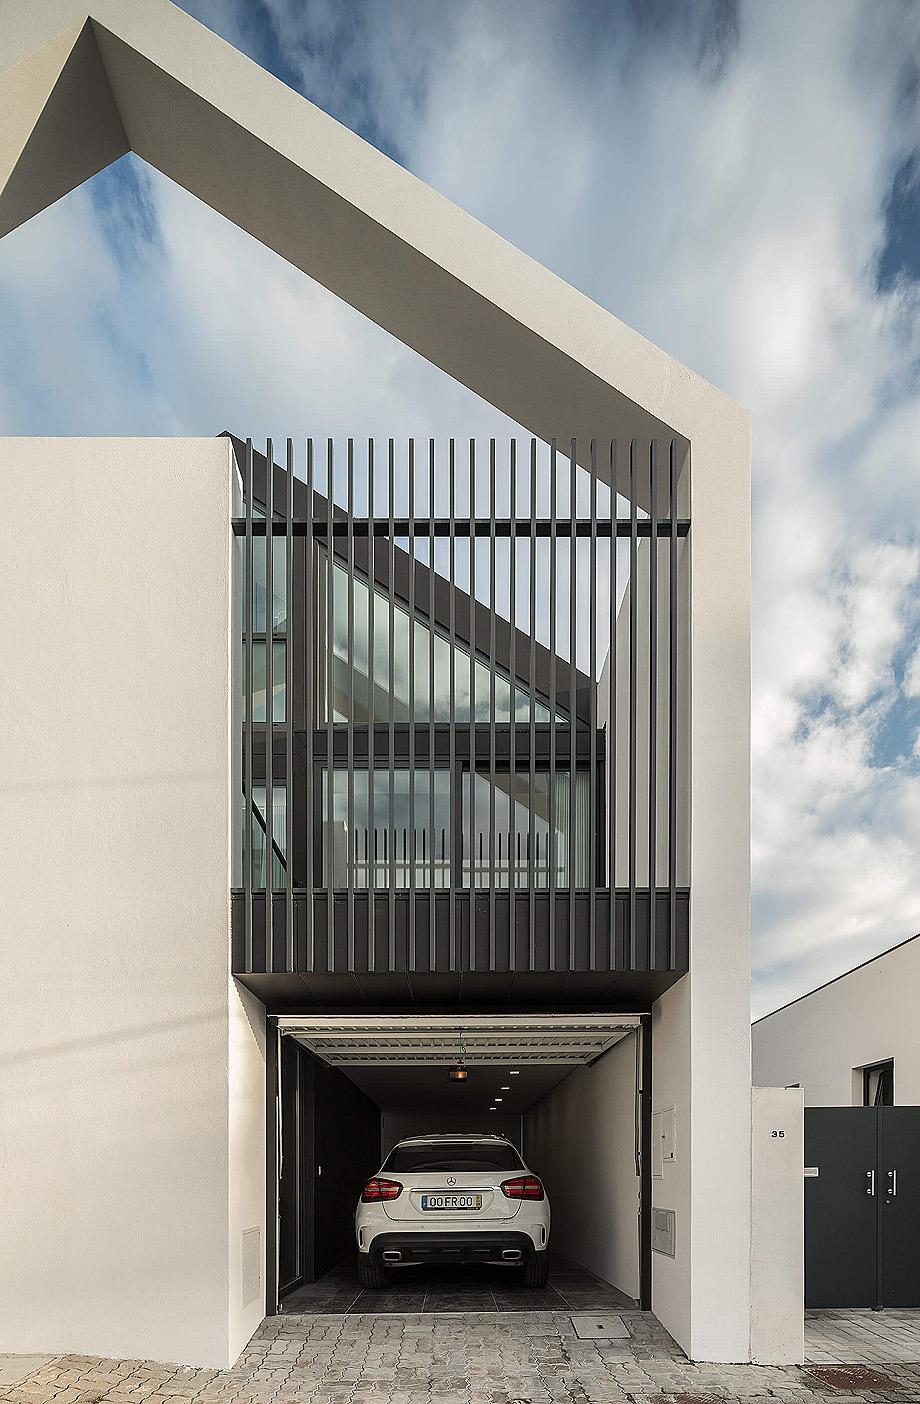 casa do arco de frari architecture network - foto ivo tavares (38)